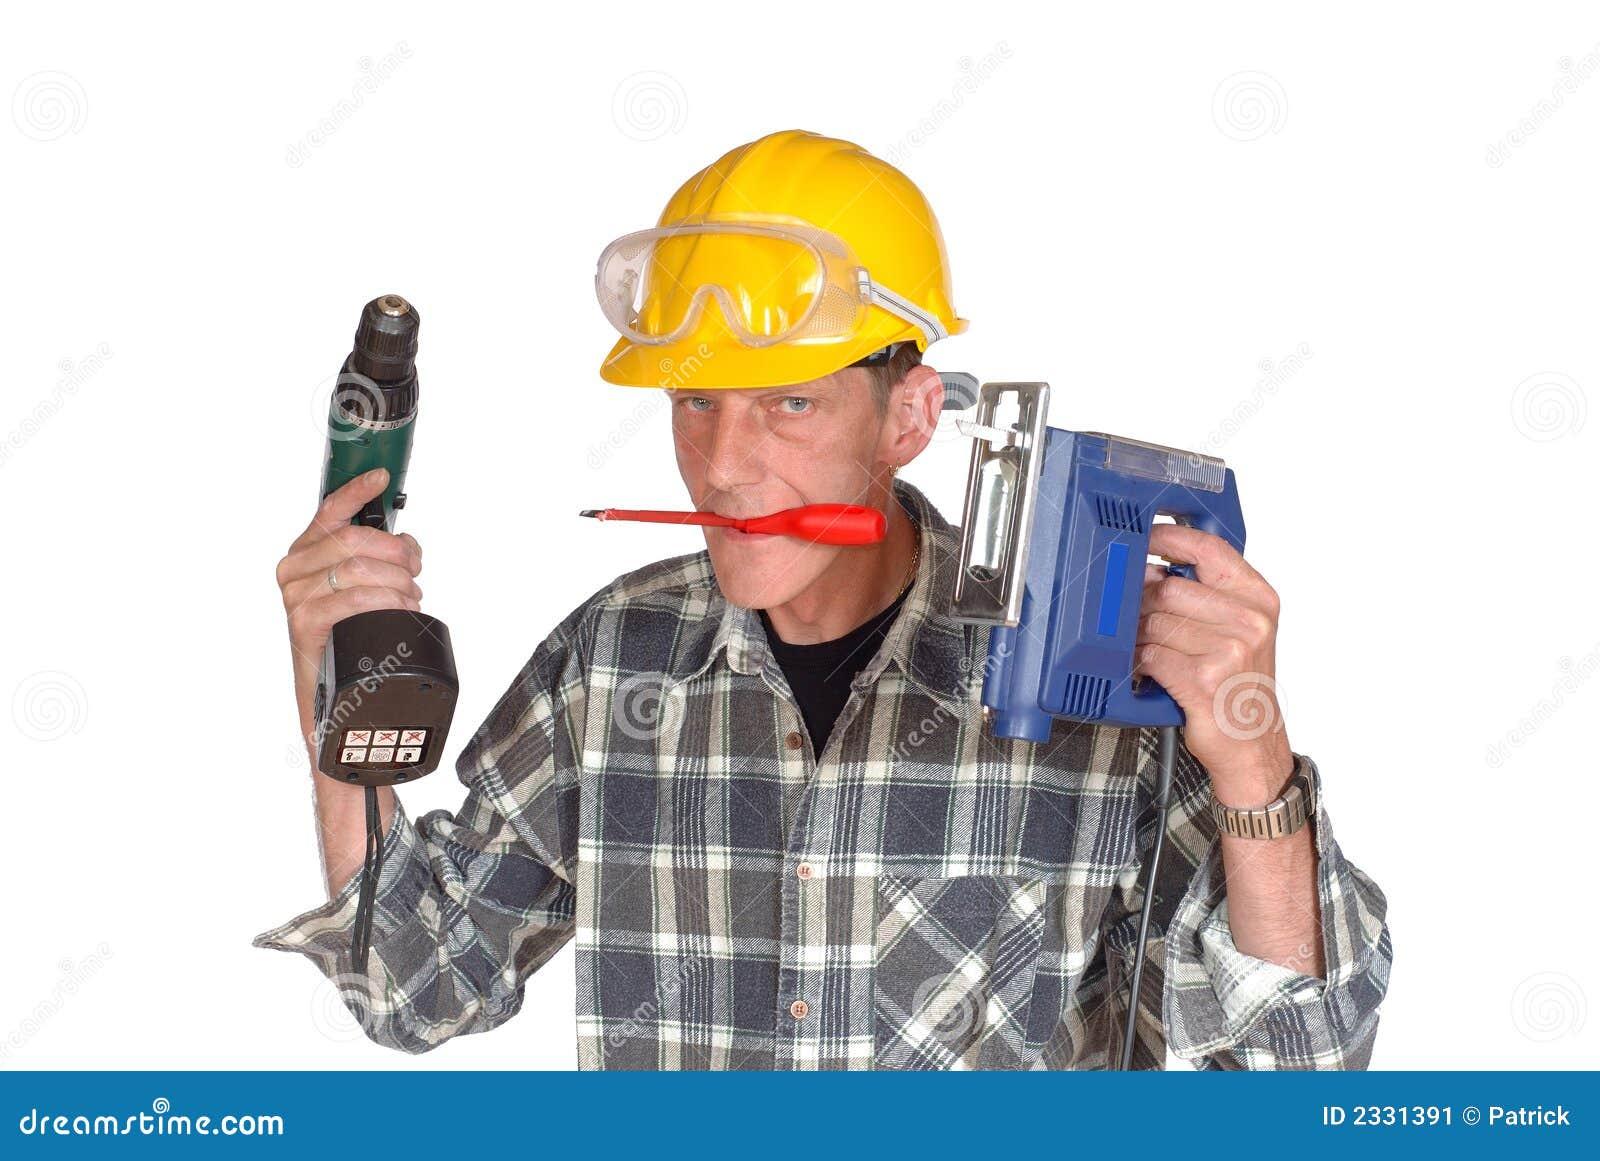 how to run a successful handyman business